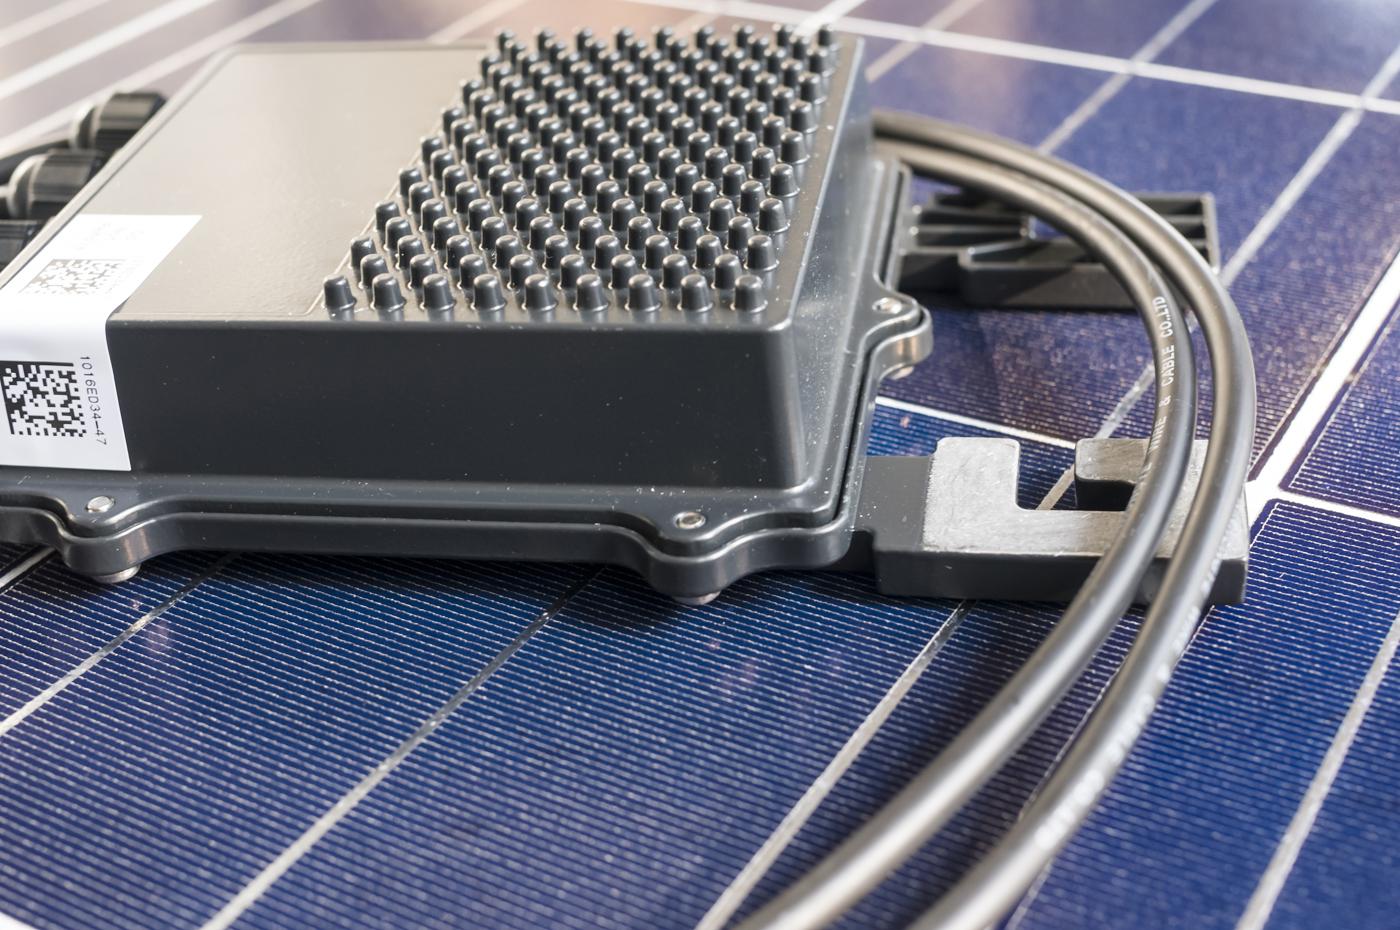 Solaredge Technologies stock, Solaredge stock, SEDG stock, solar enery stocks